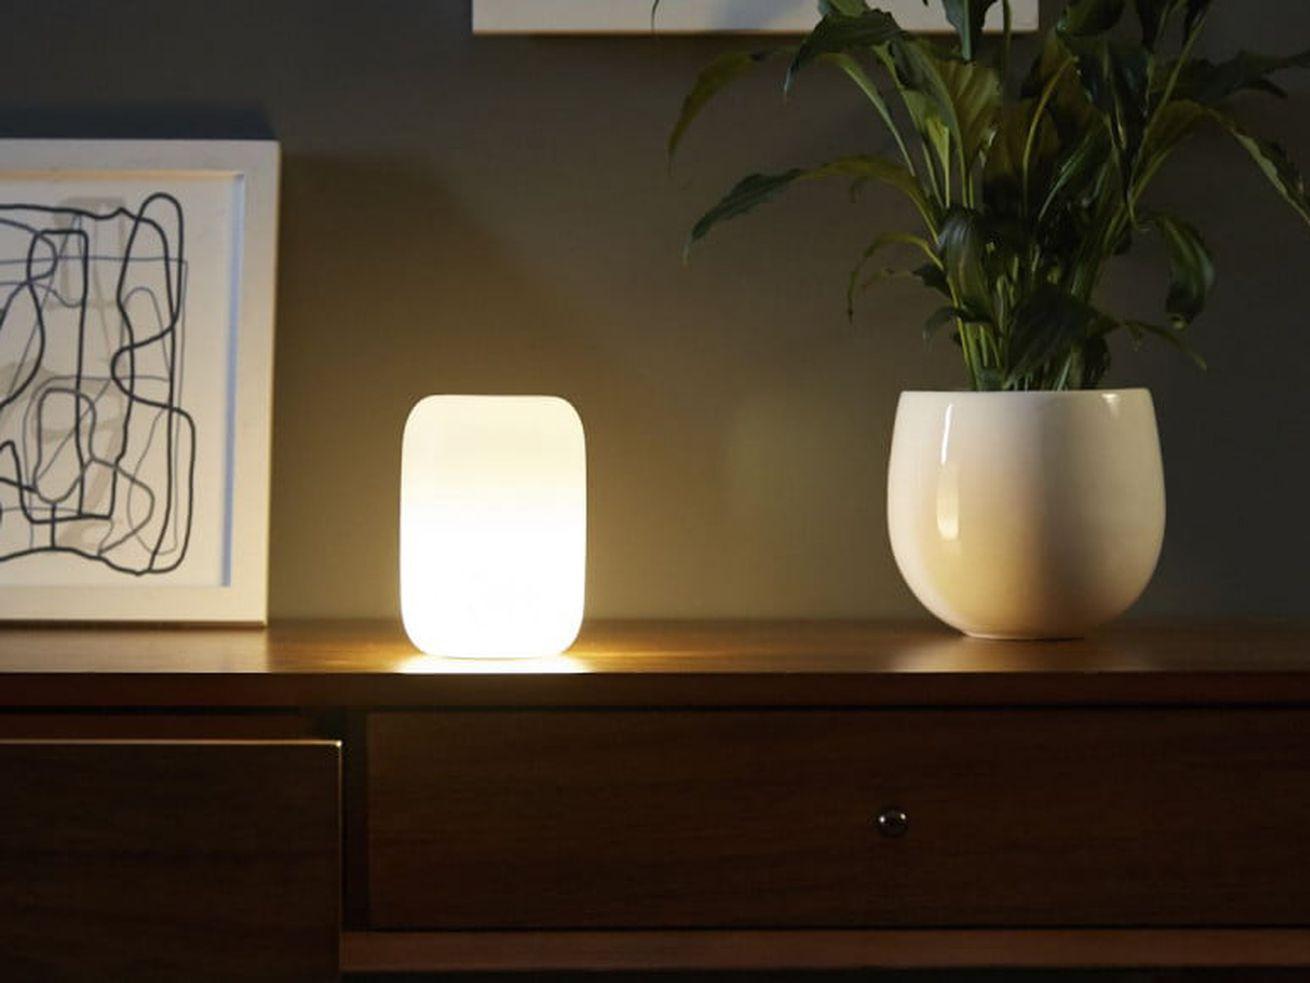 Casper now sells a smart nightlight